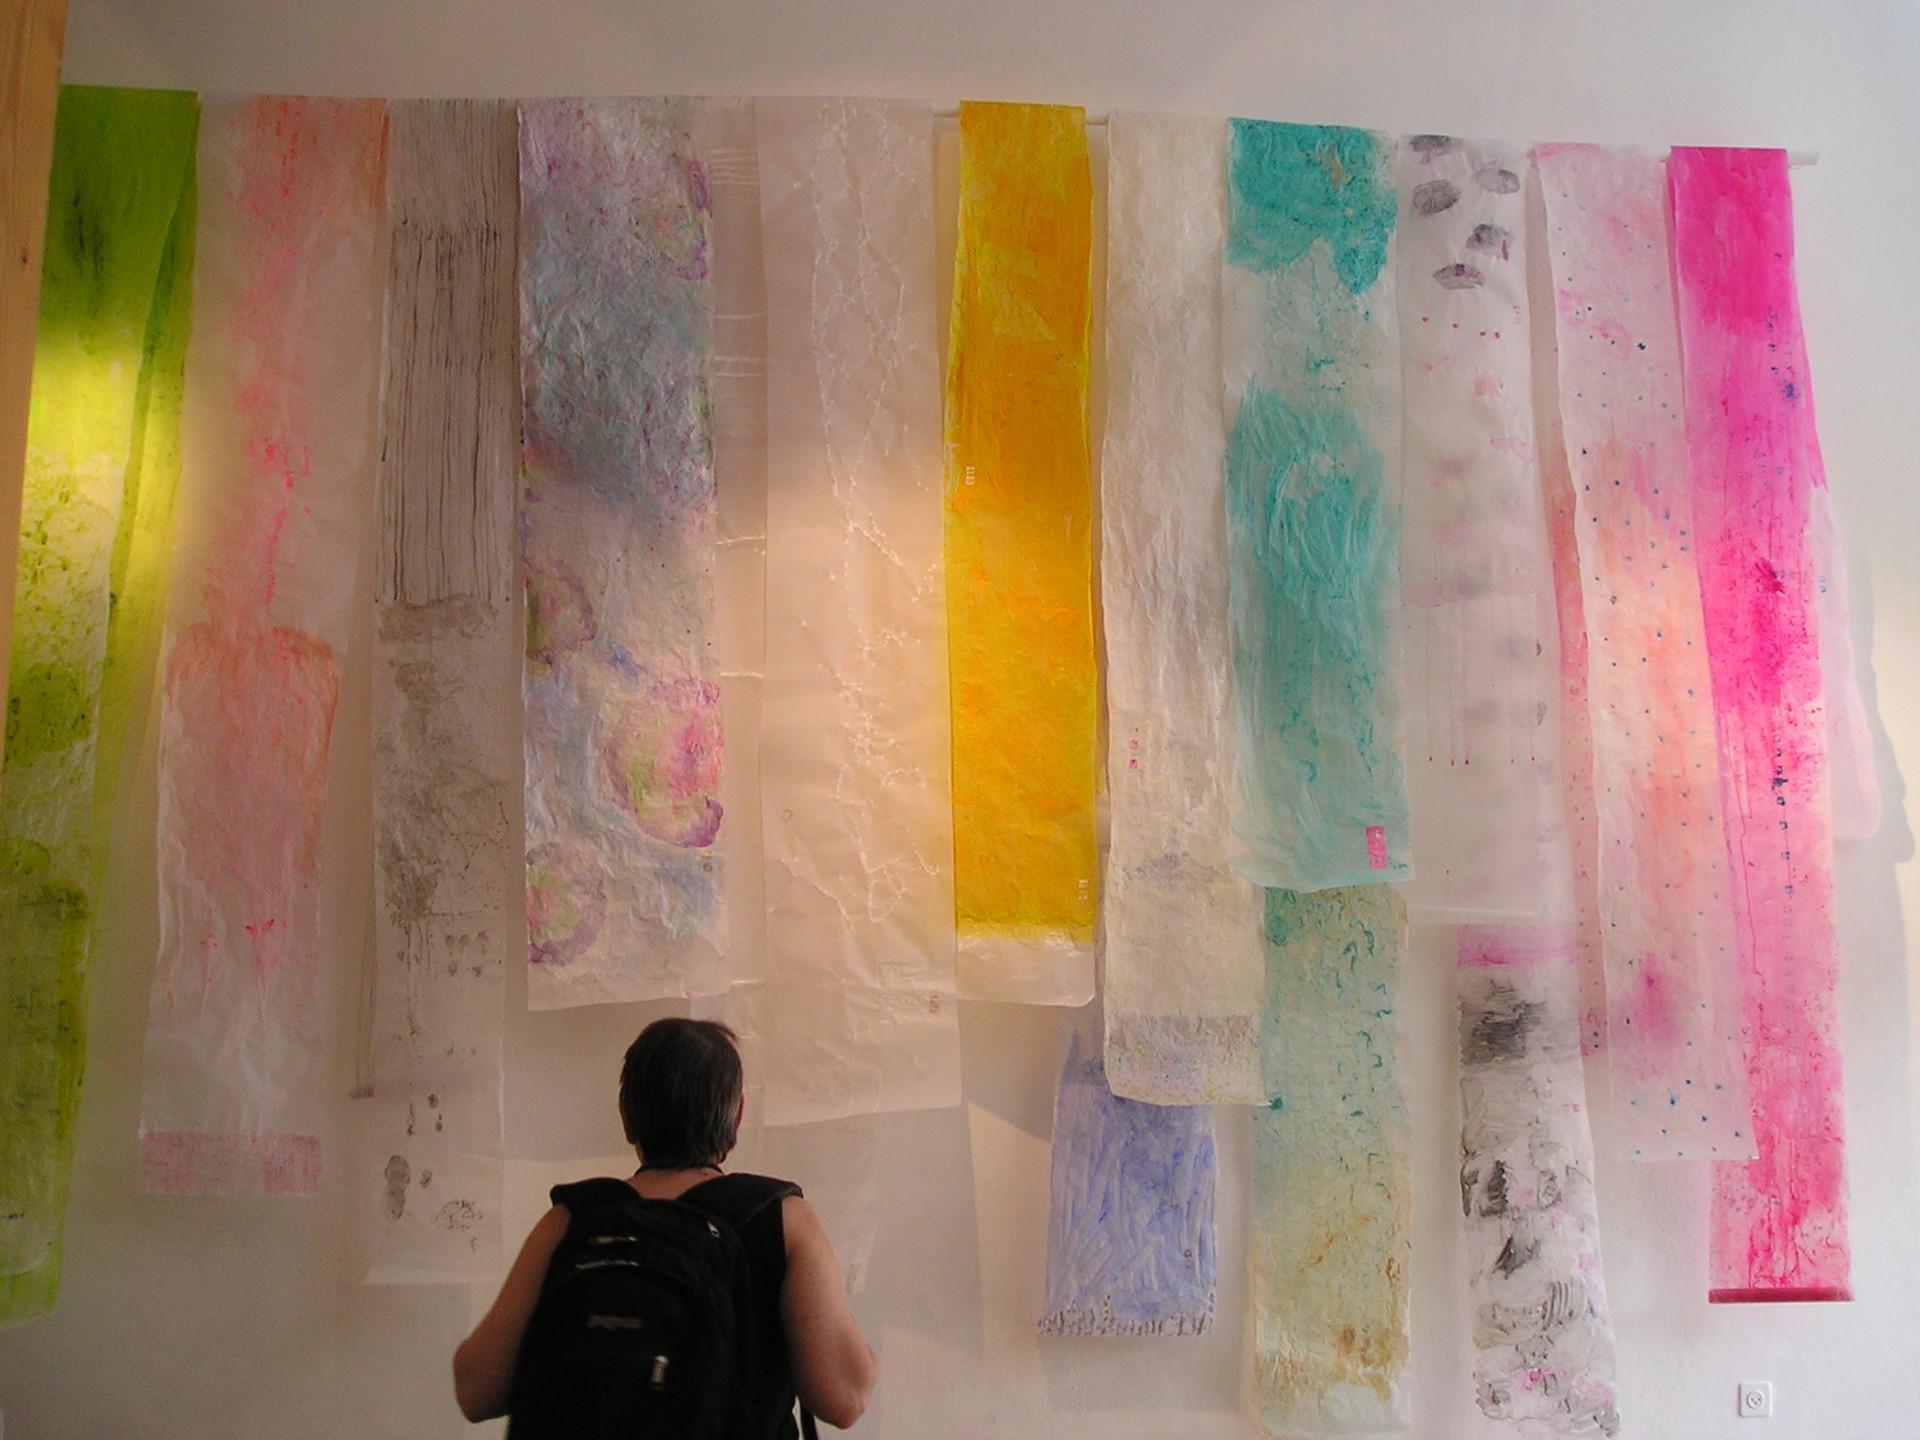 Japana-Drying Silks, Wall Installation